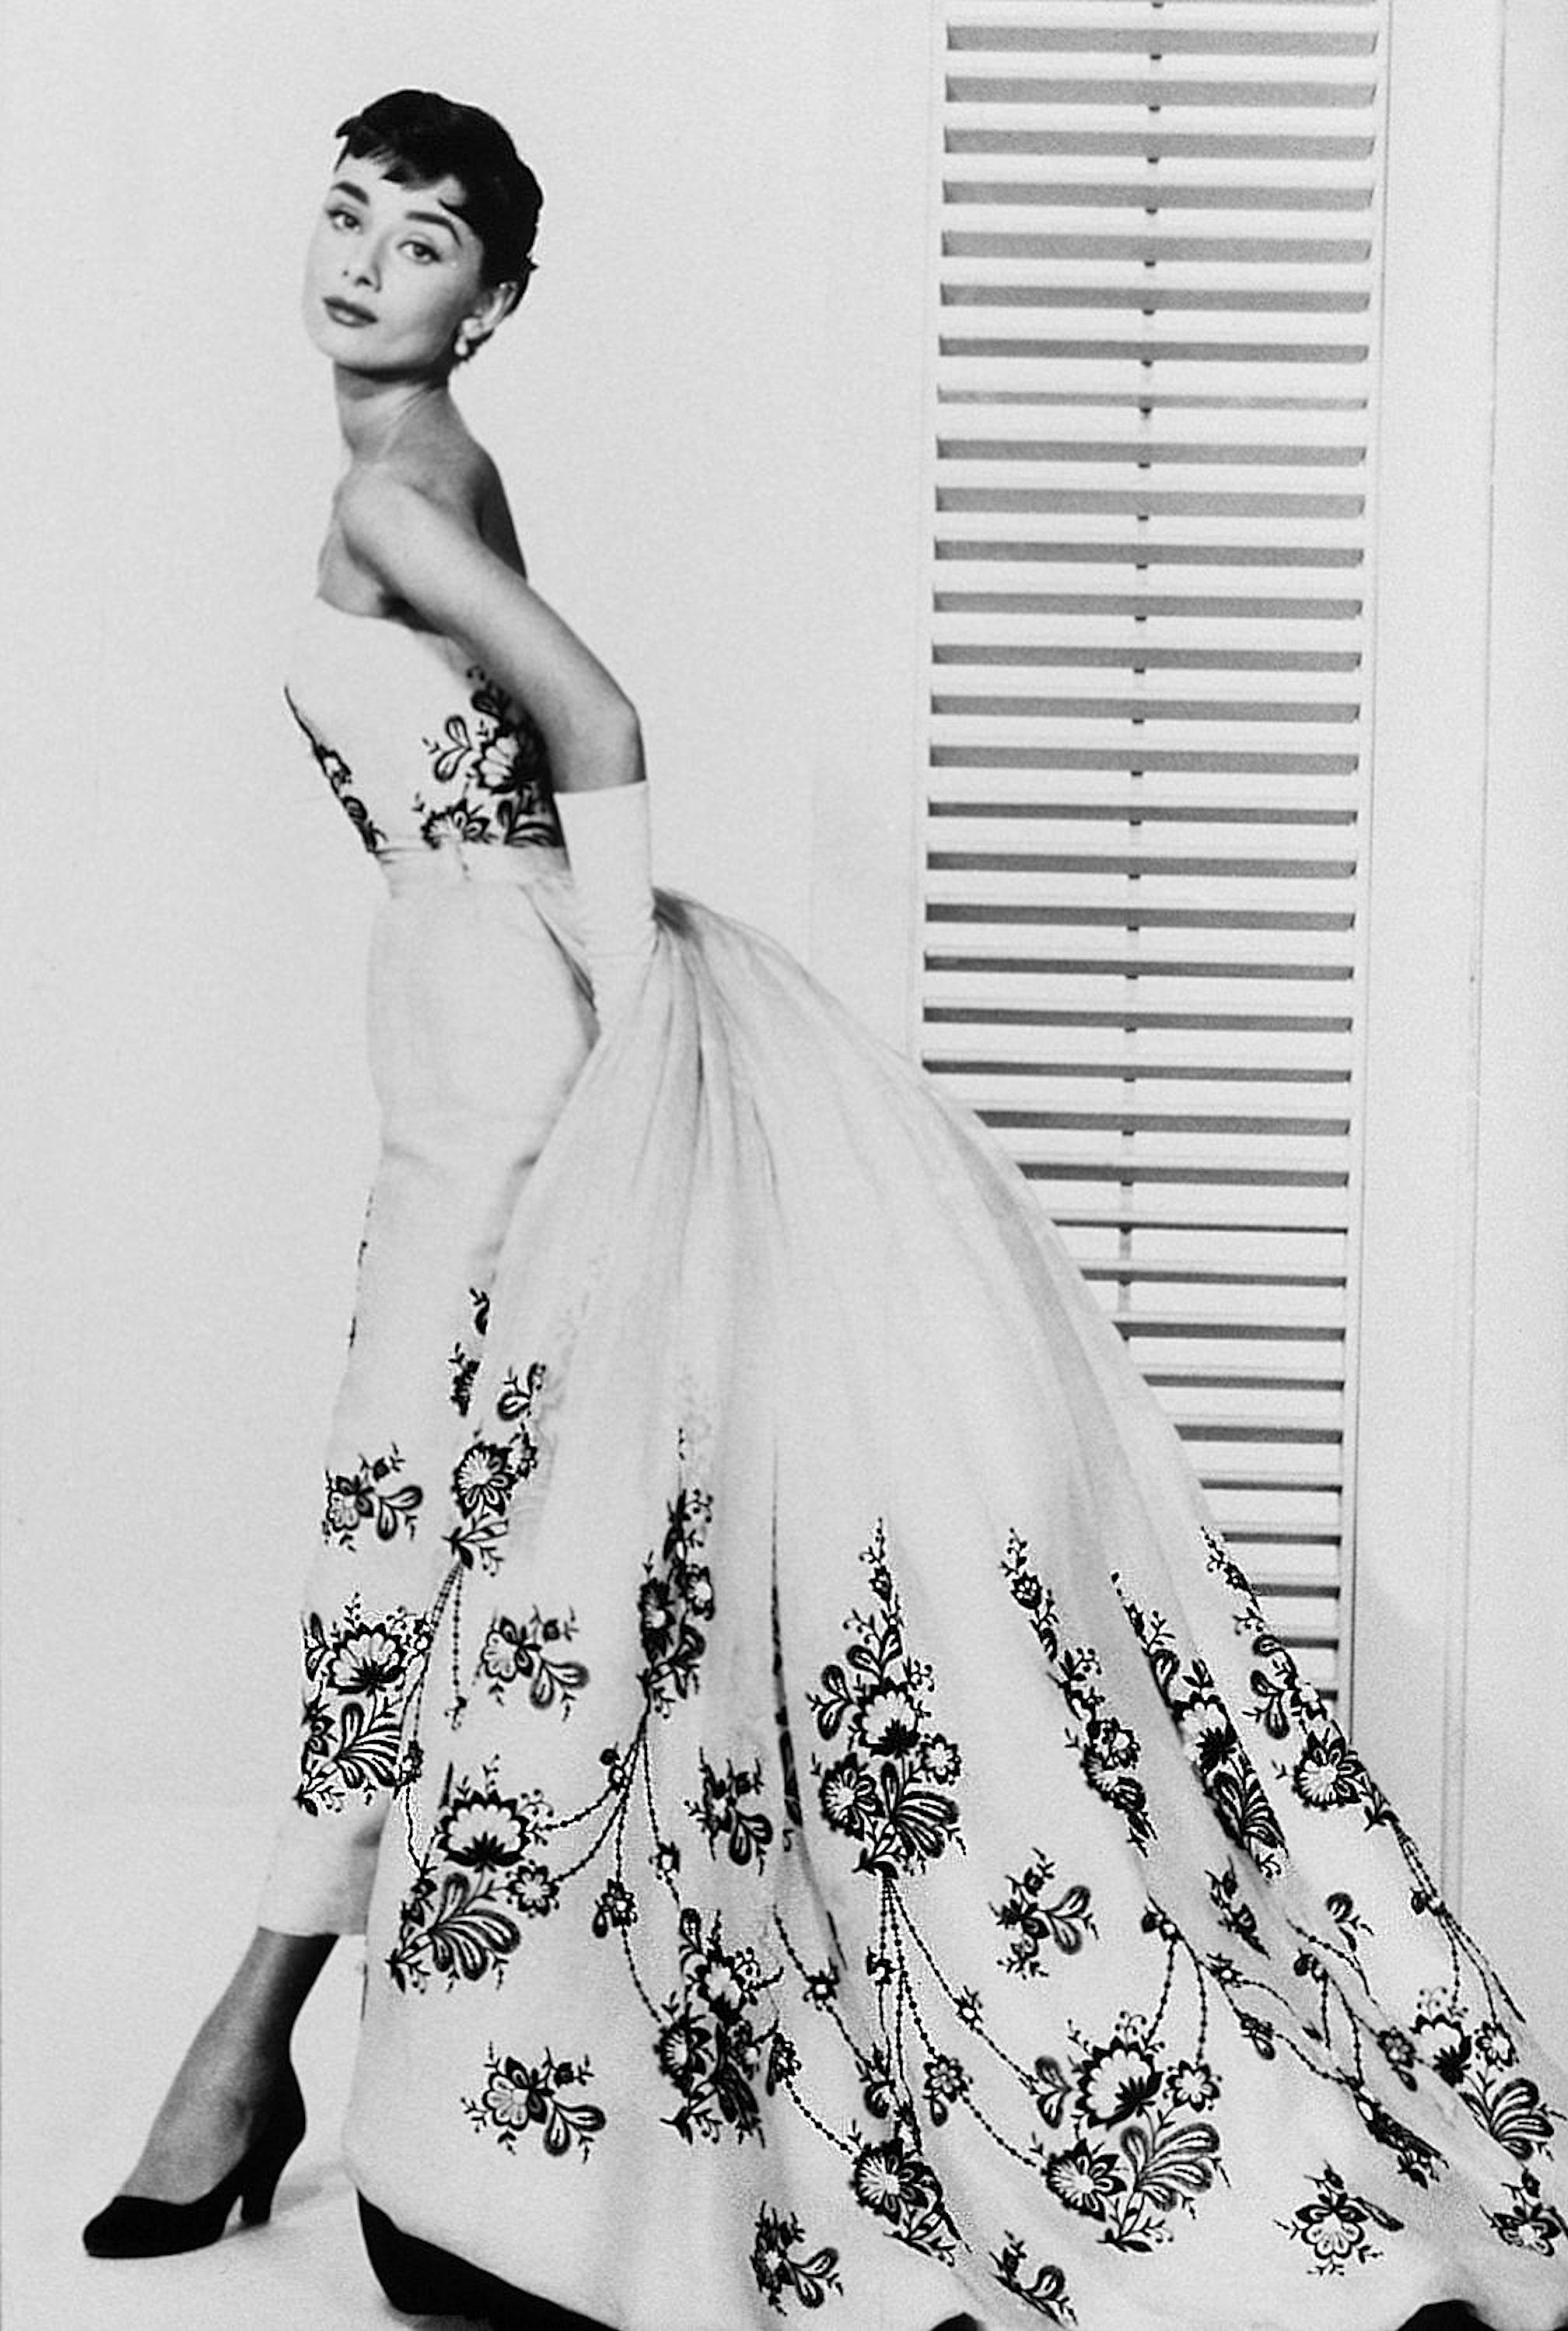 Audrey Hepburn In Givenchy 1954 Sabrina Costumes By Hubert De Givenchy Audrey Hepburn Style Audrey Hepburn Dress Givenchy Dress